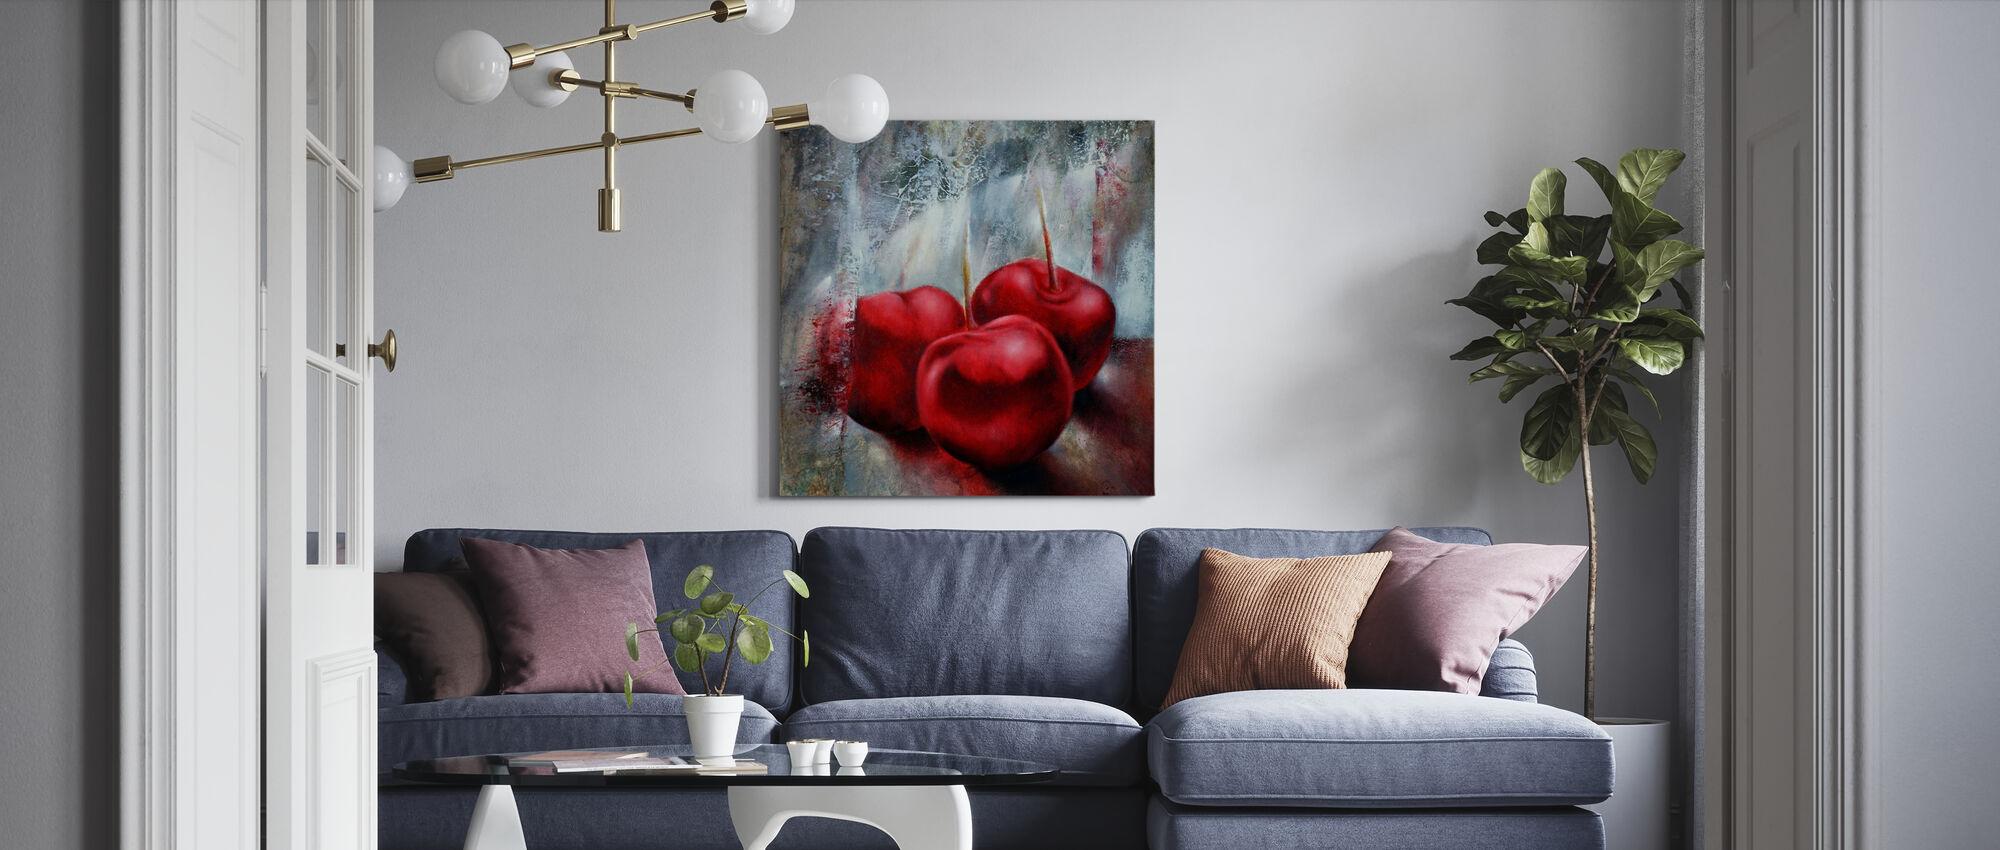 Cherries - Canvas print - Living Room